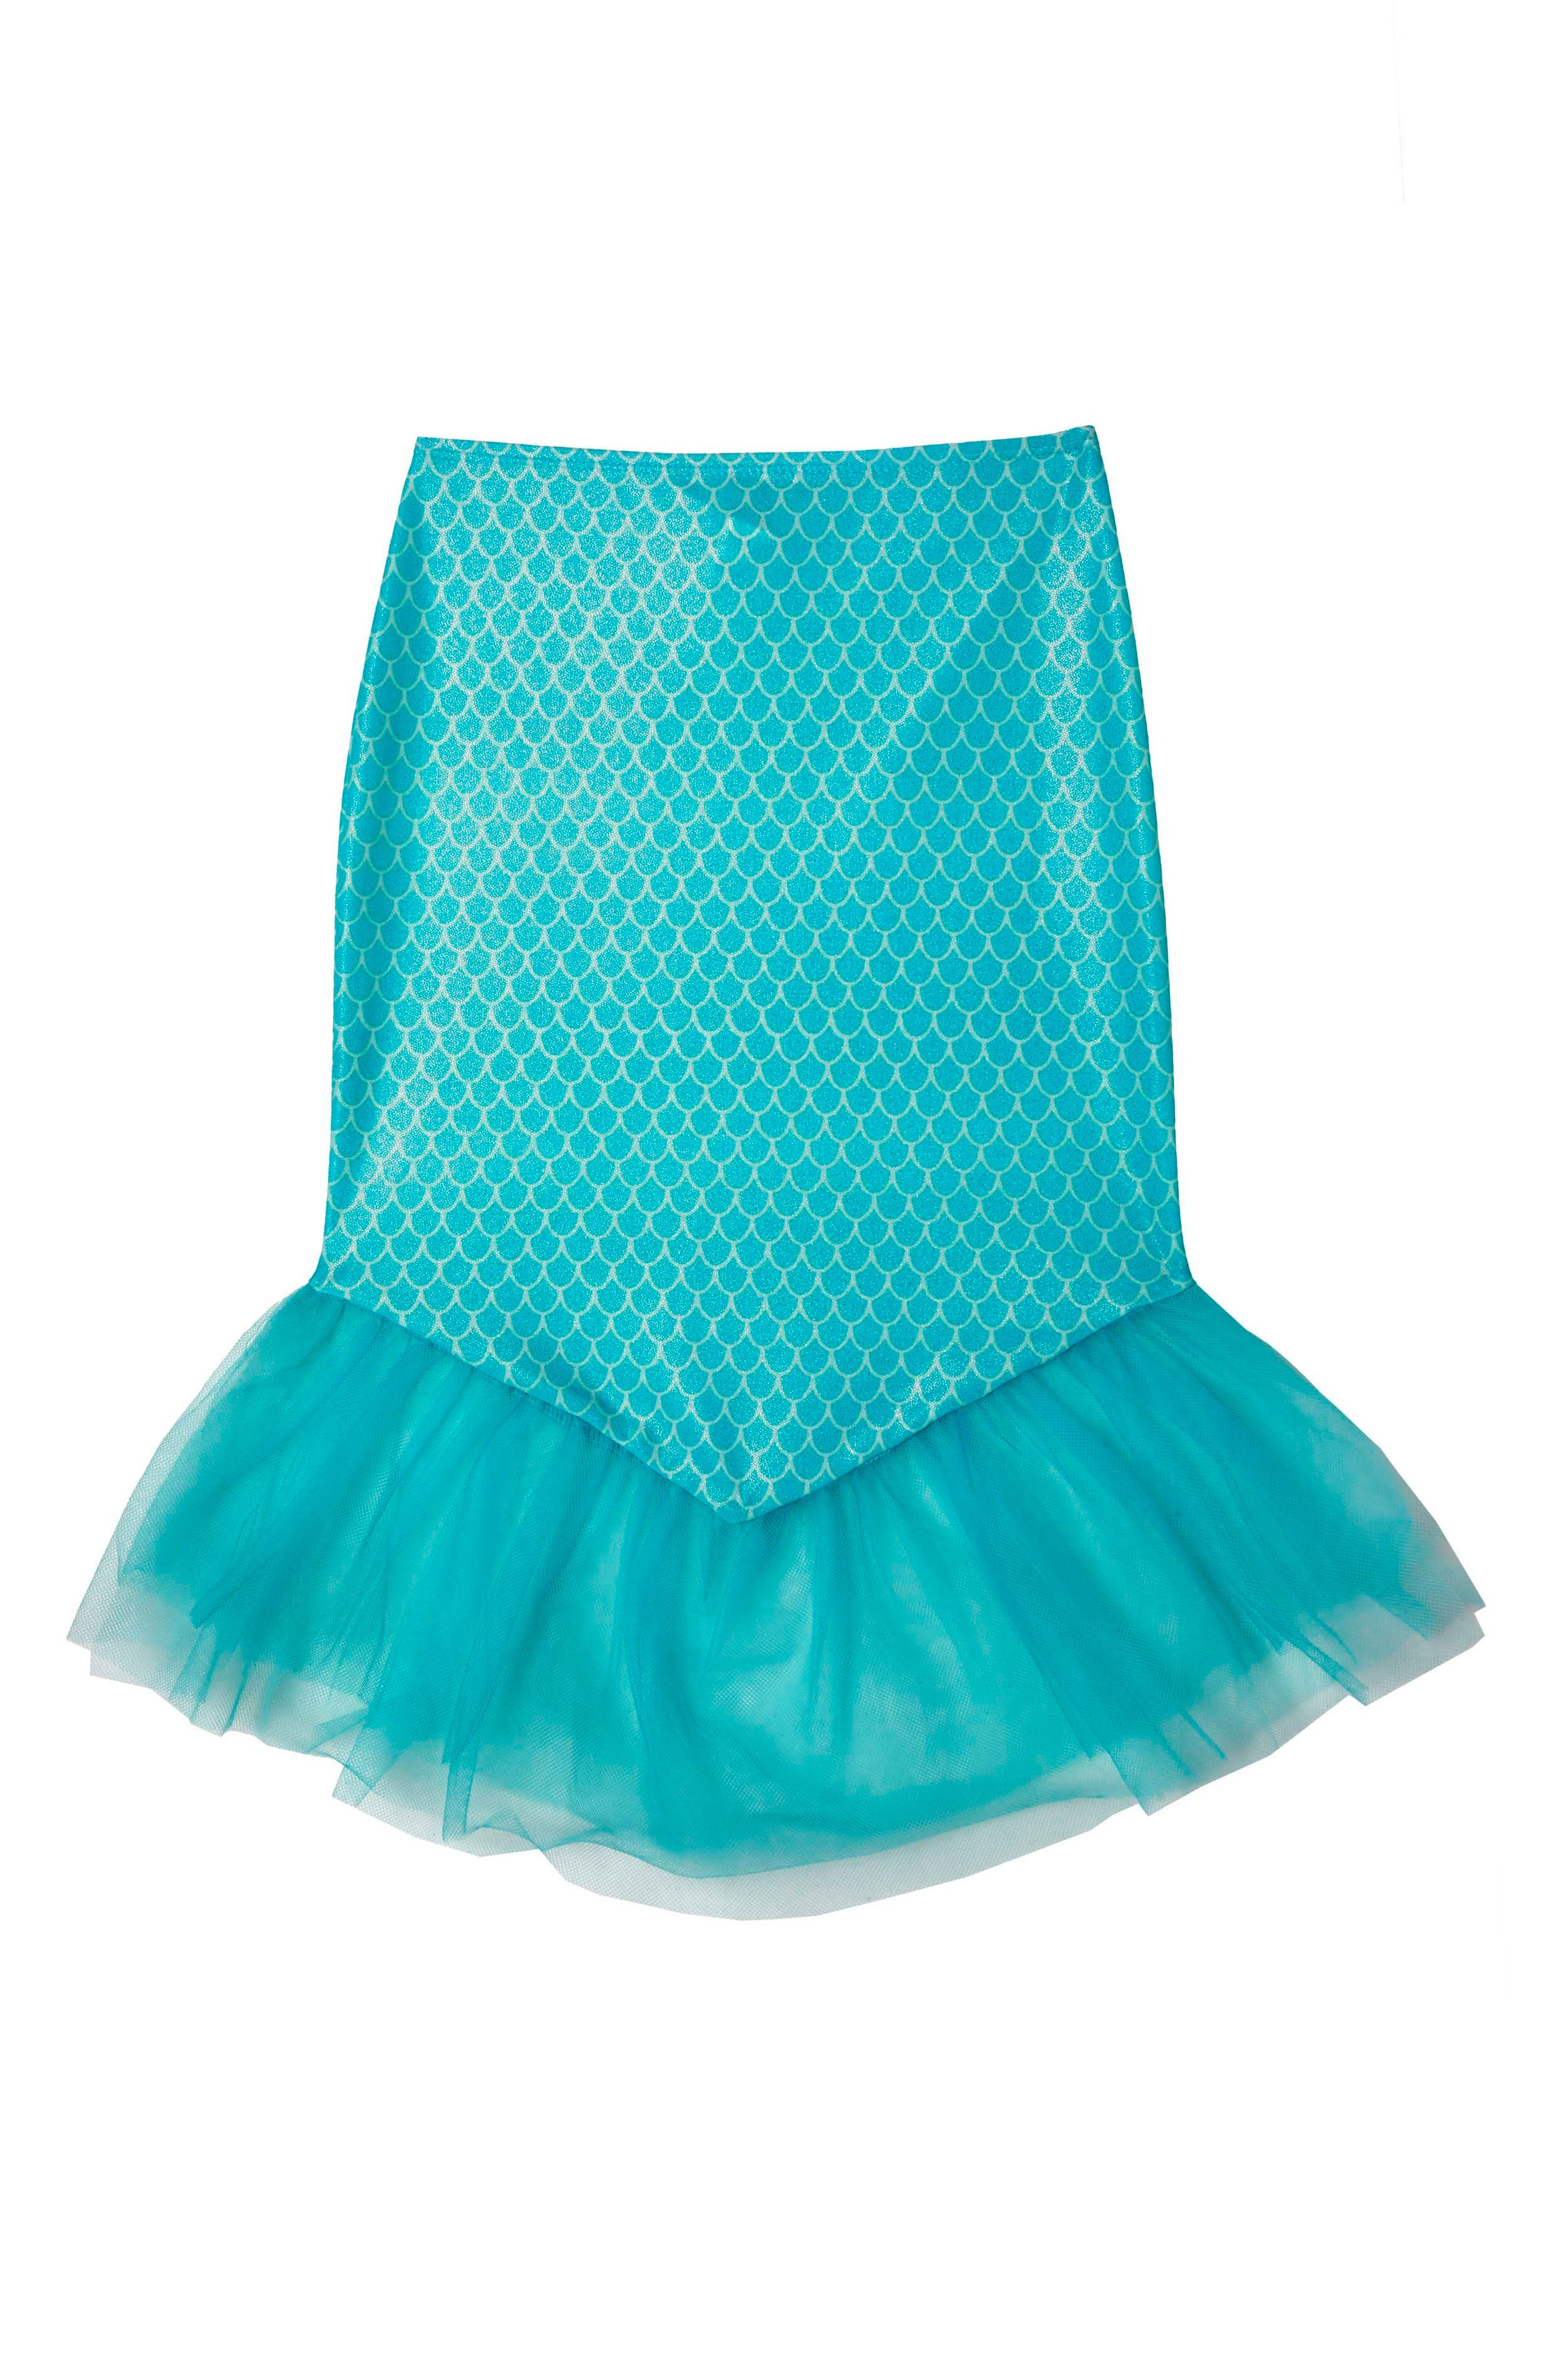 Mermaid Princess Cover-Up Skirt,                             Main thumbnail 1, color,                             Aqua